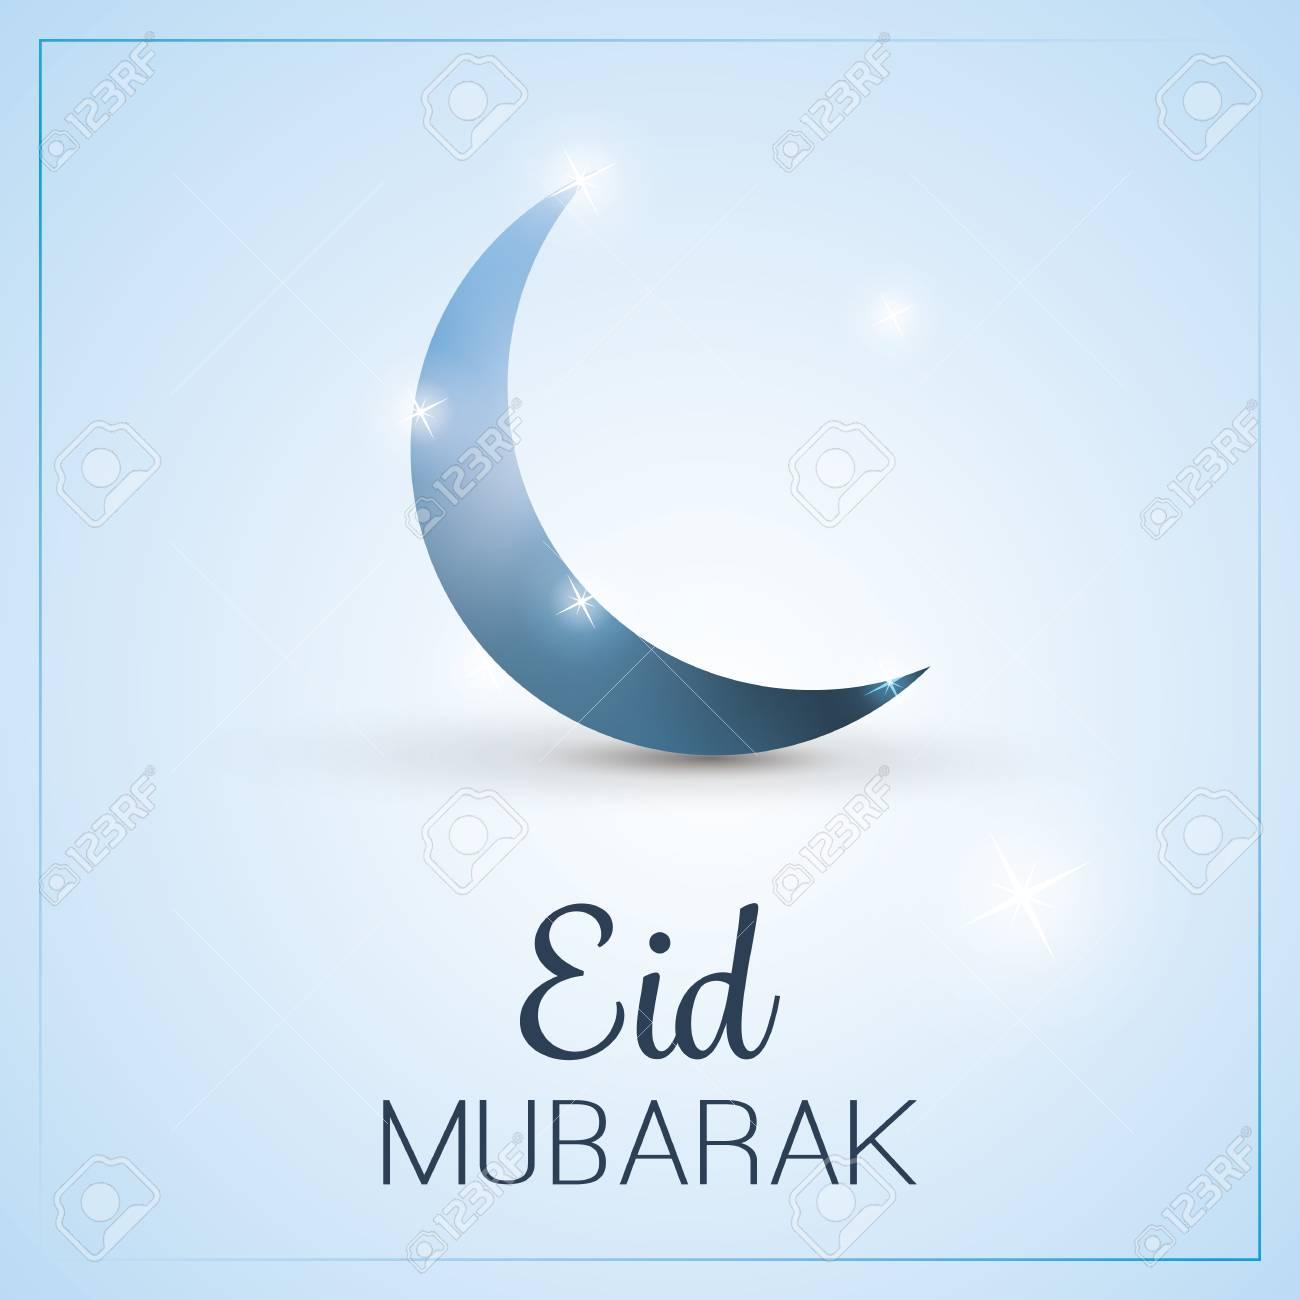 Eid Mubarak Moon In The Sky Greeting Card For Muslim Community